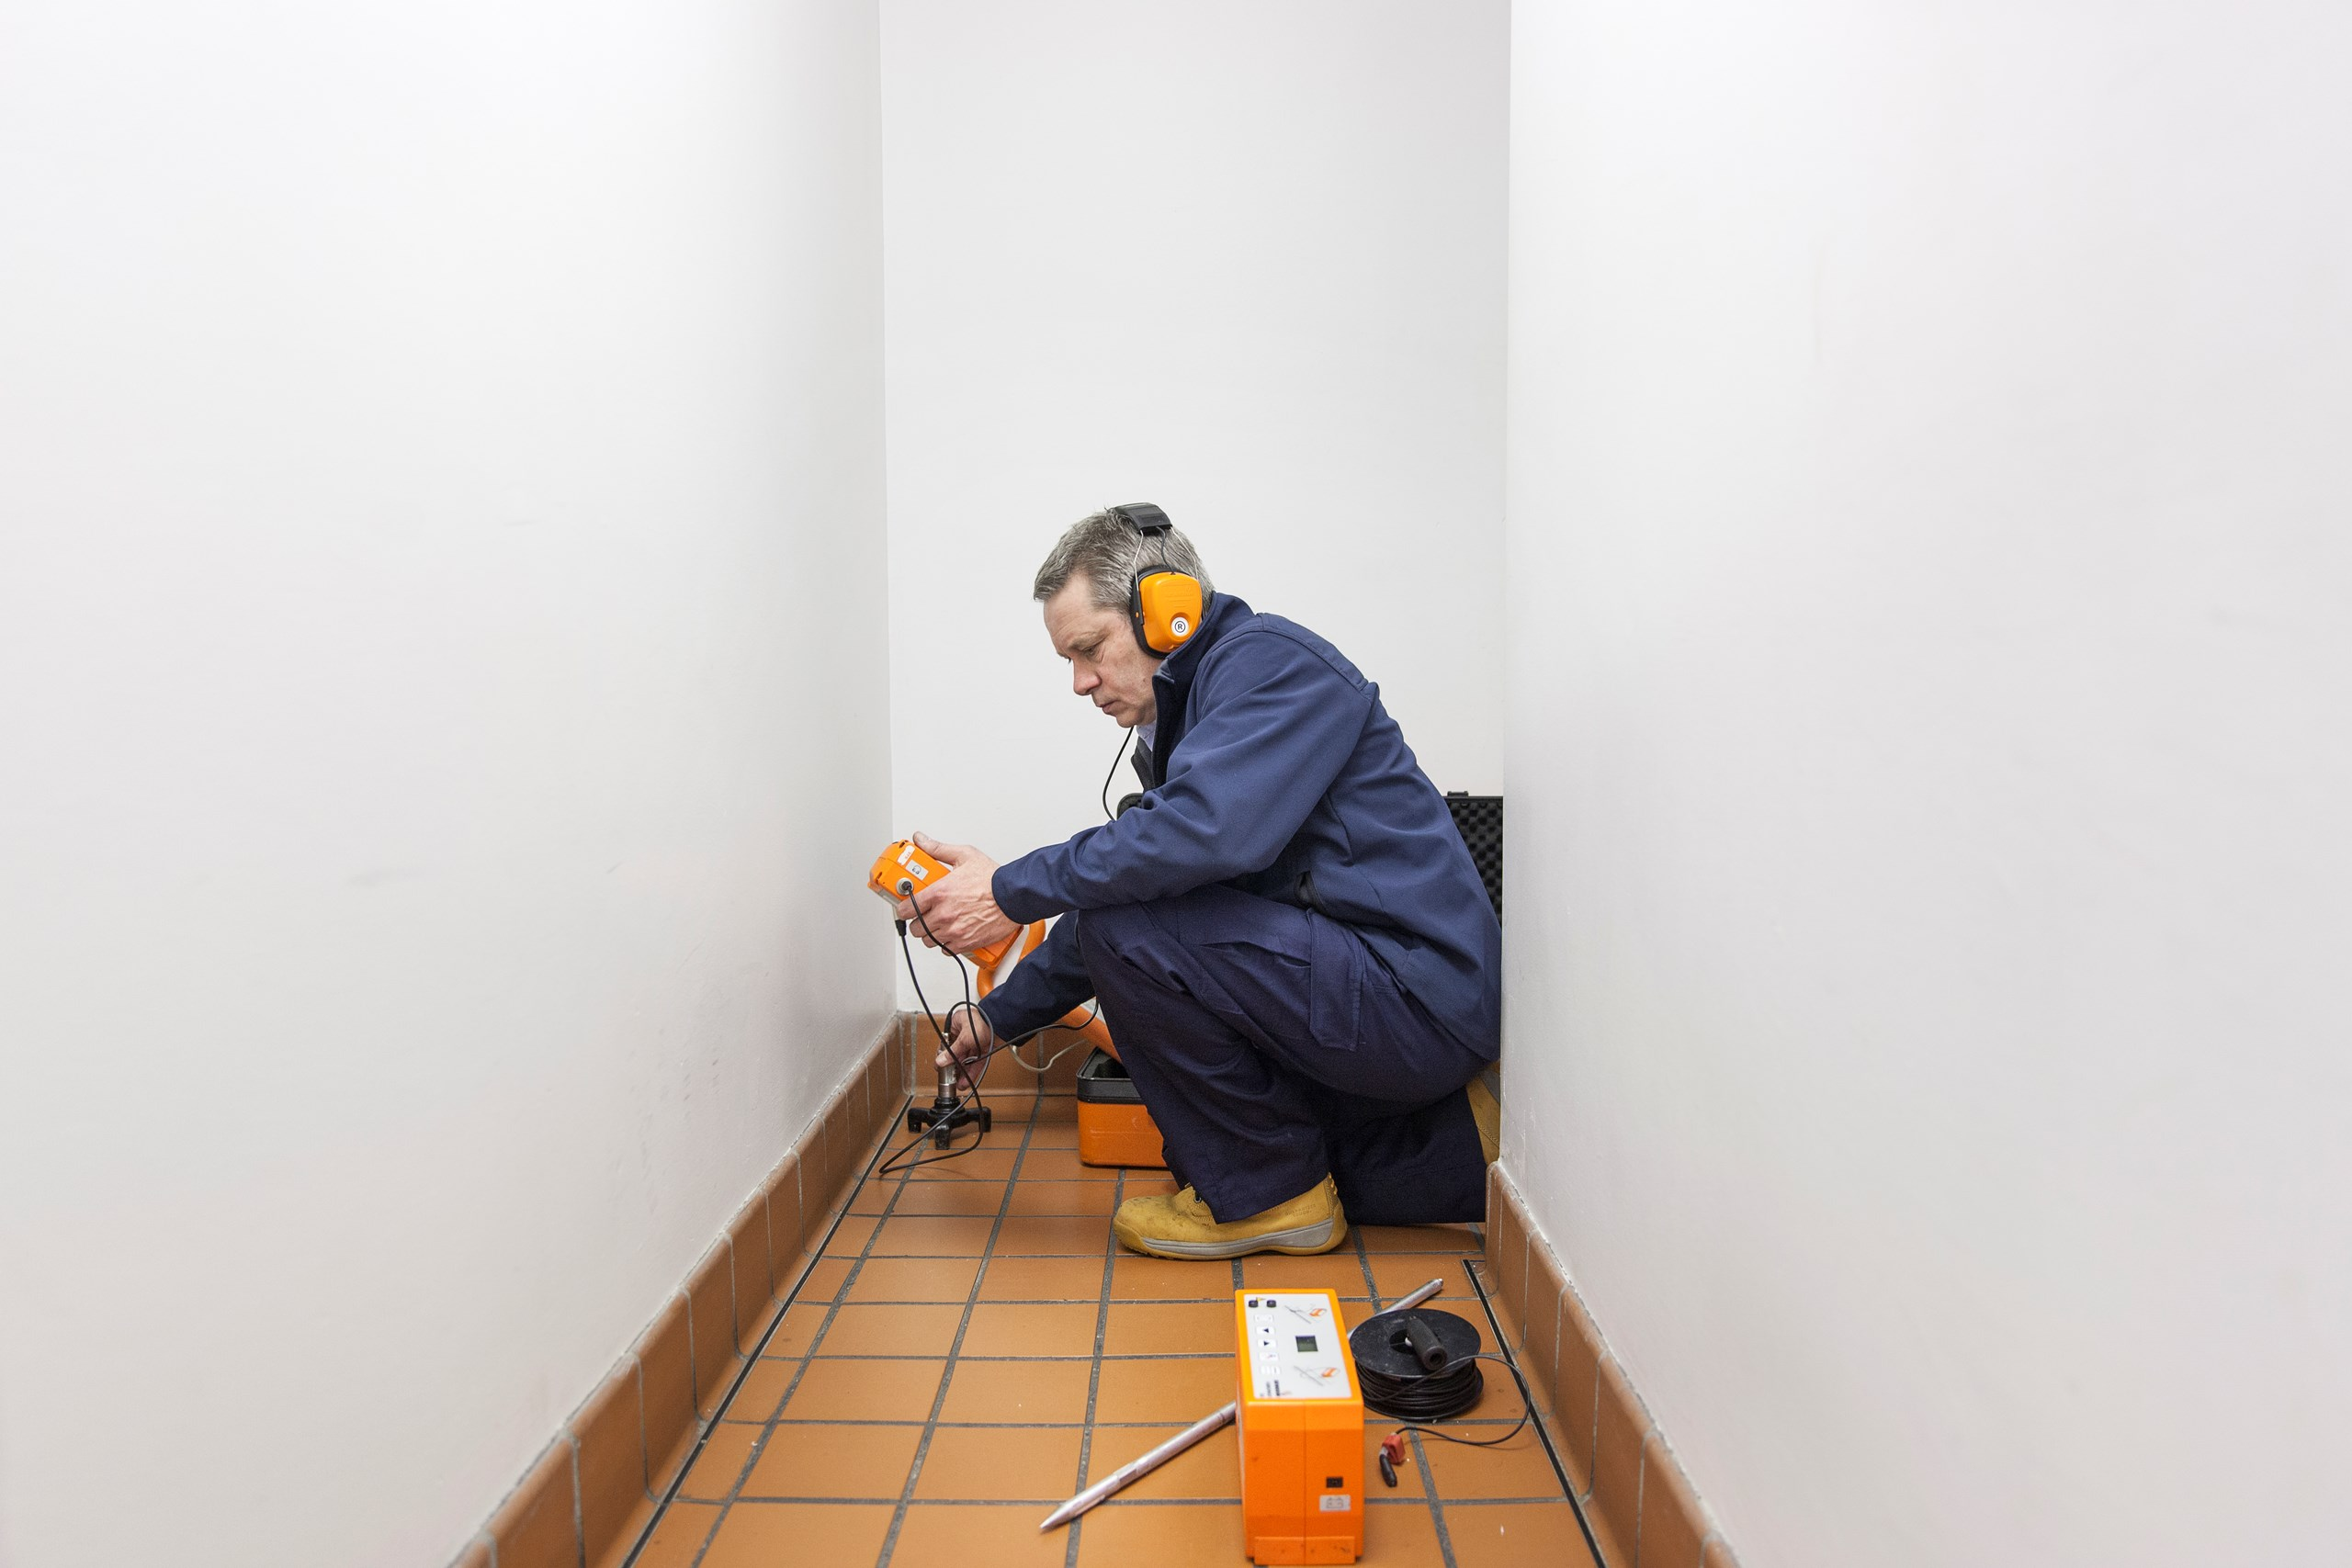 Lekkage Plafond Woonkamer : Lekkage snel opsporen zonder hak en breekwerk polygon